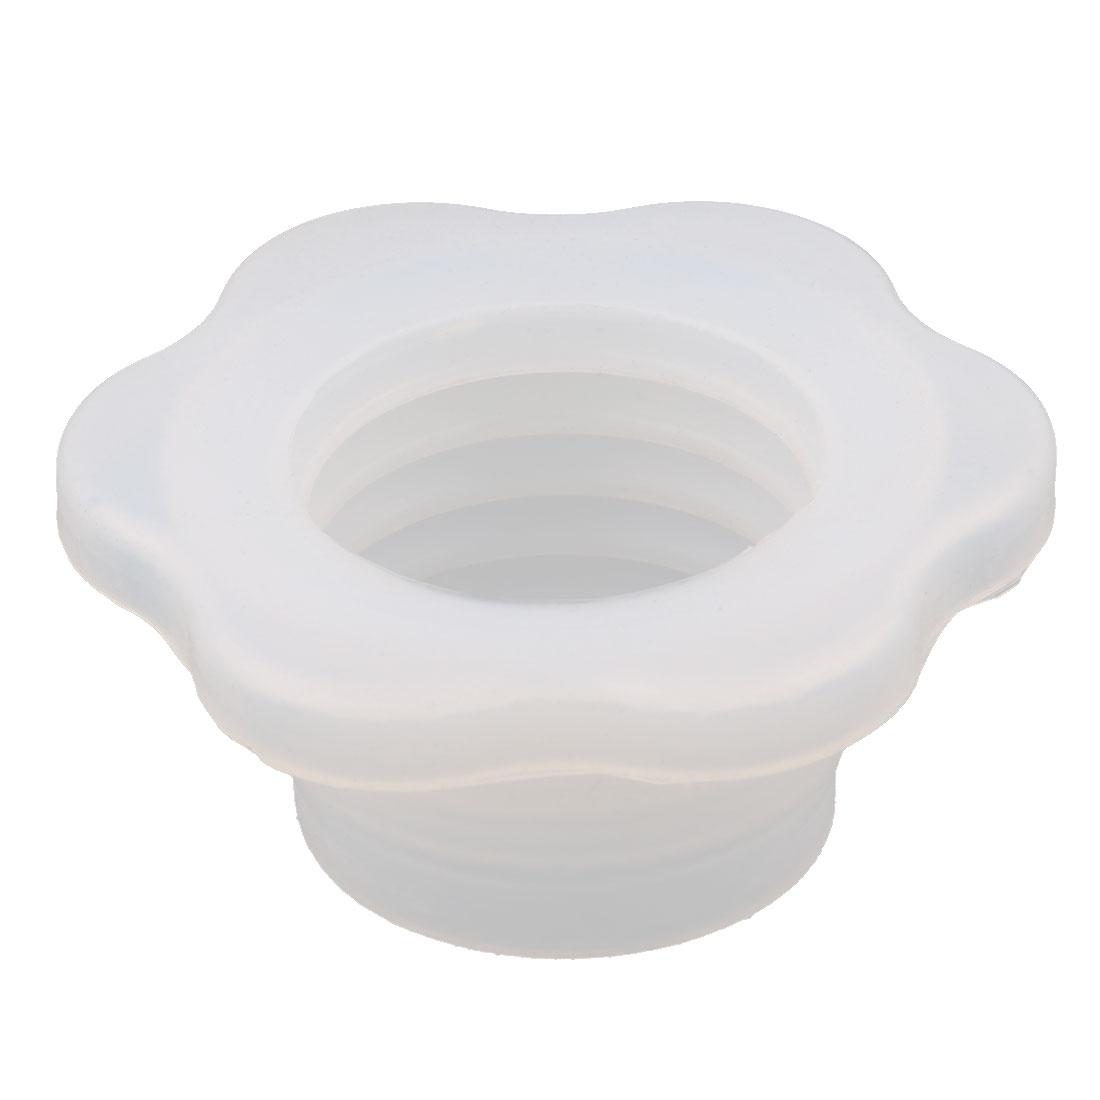 Washing Machine Rubber Flower Shaped Sewer Washer Deodorant Ring Seal White